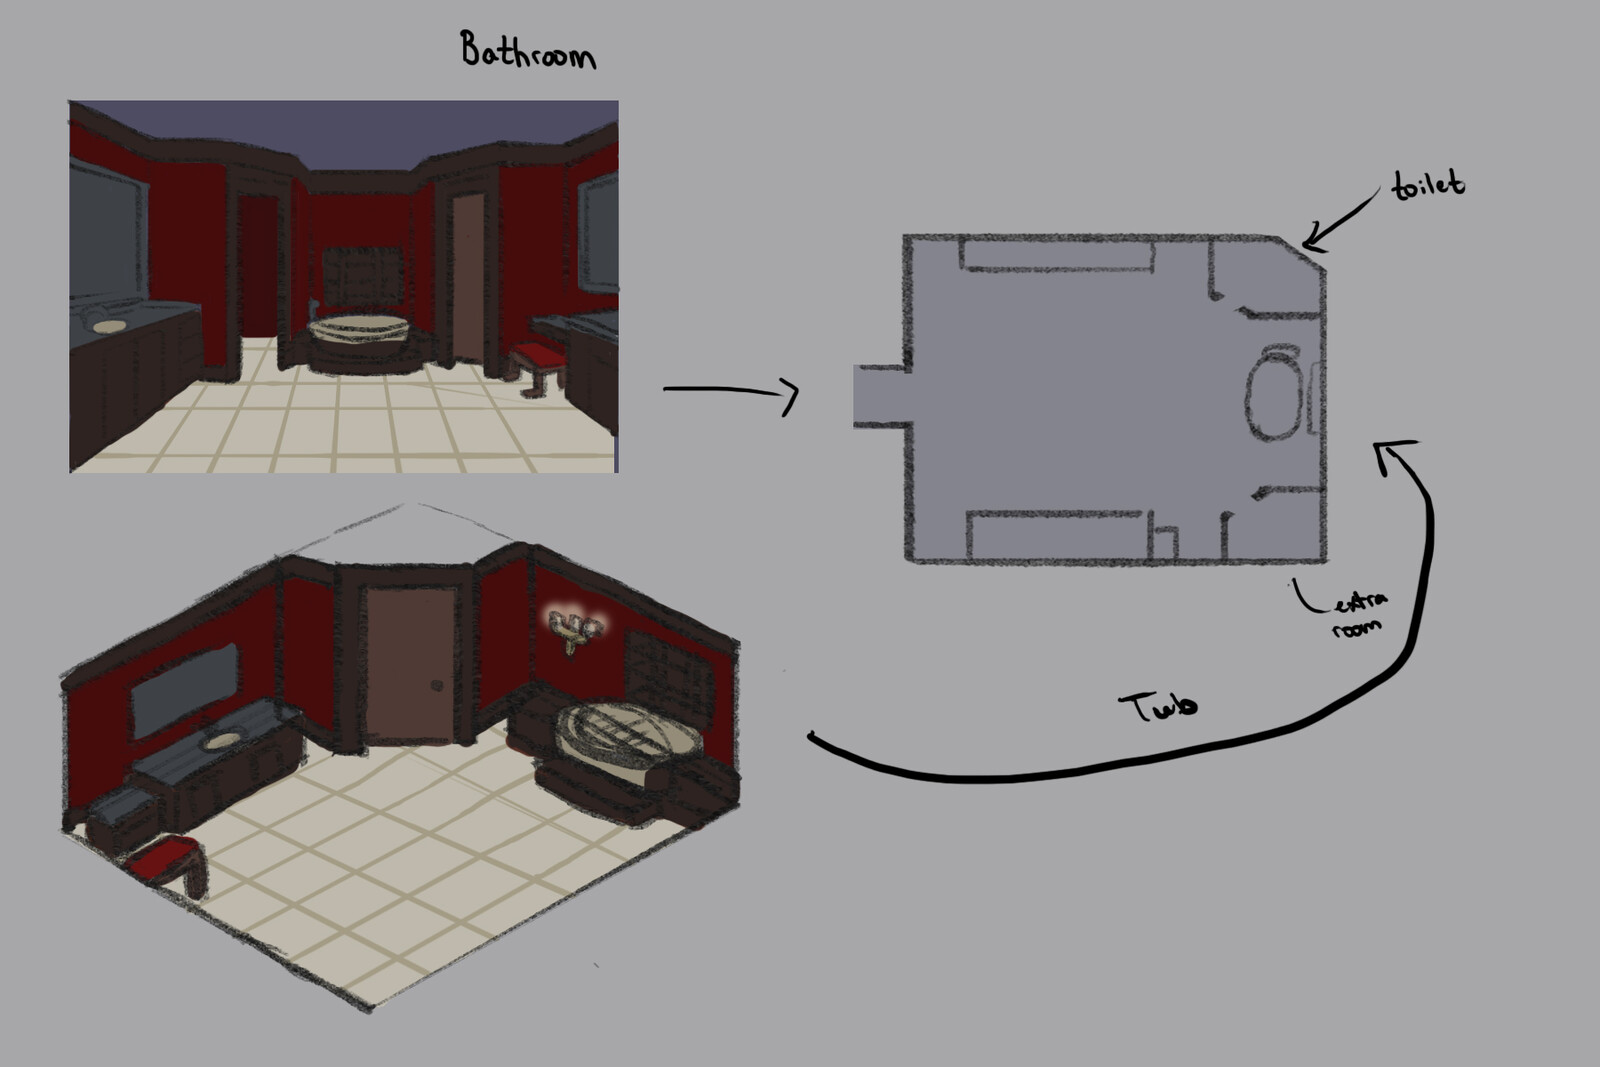 Concept Art: Bathroom